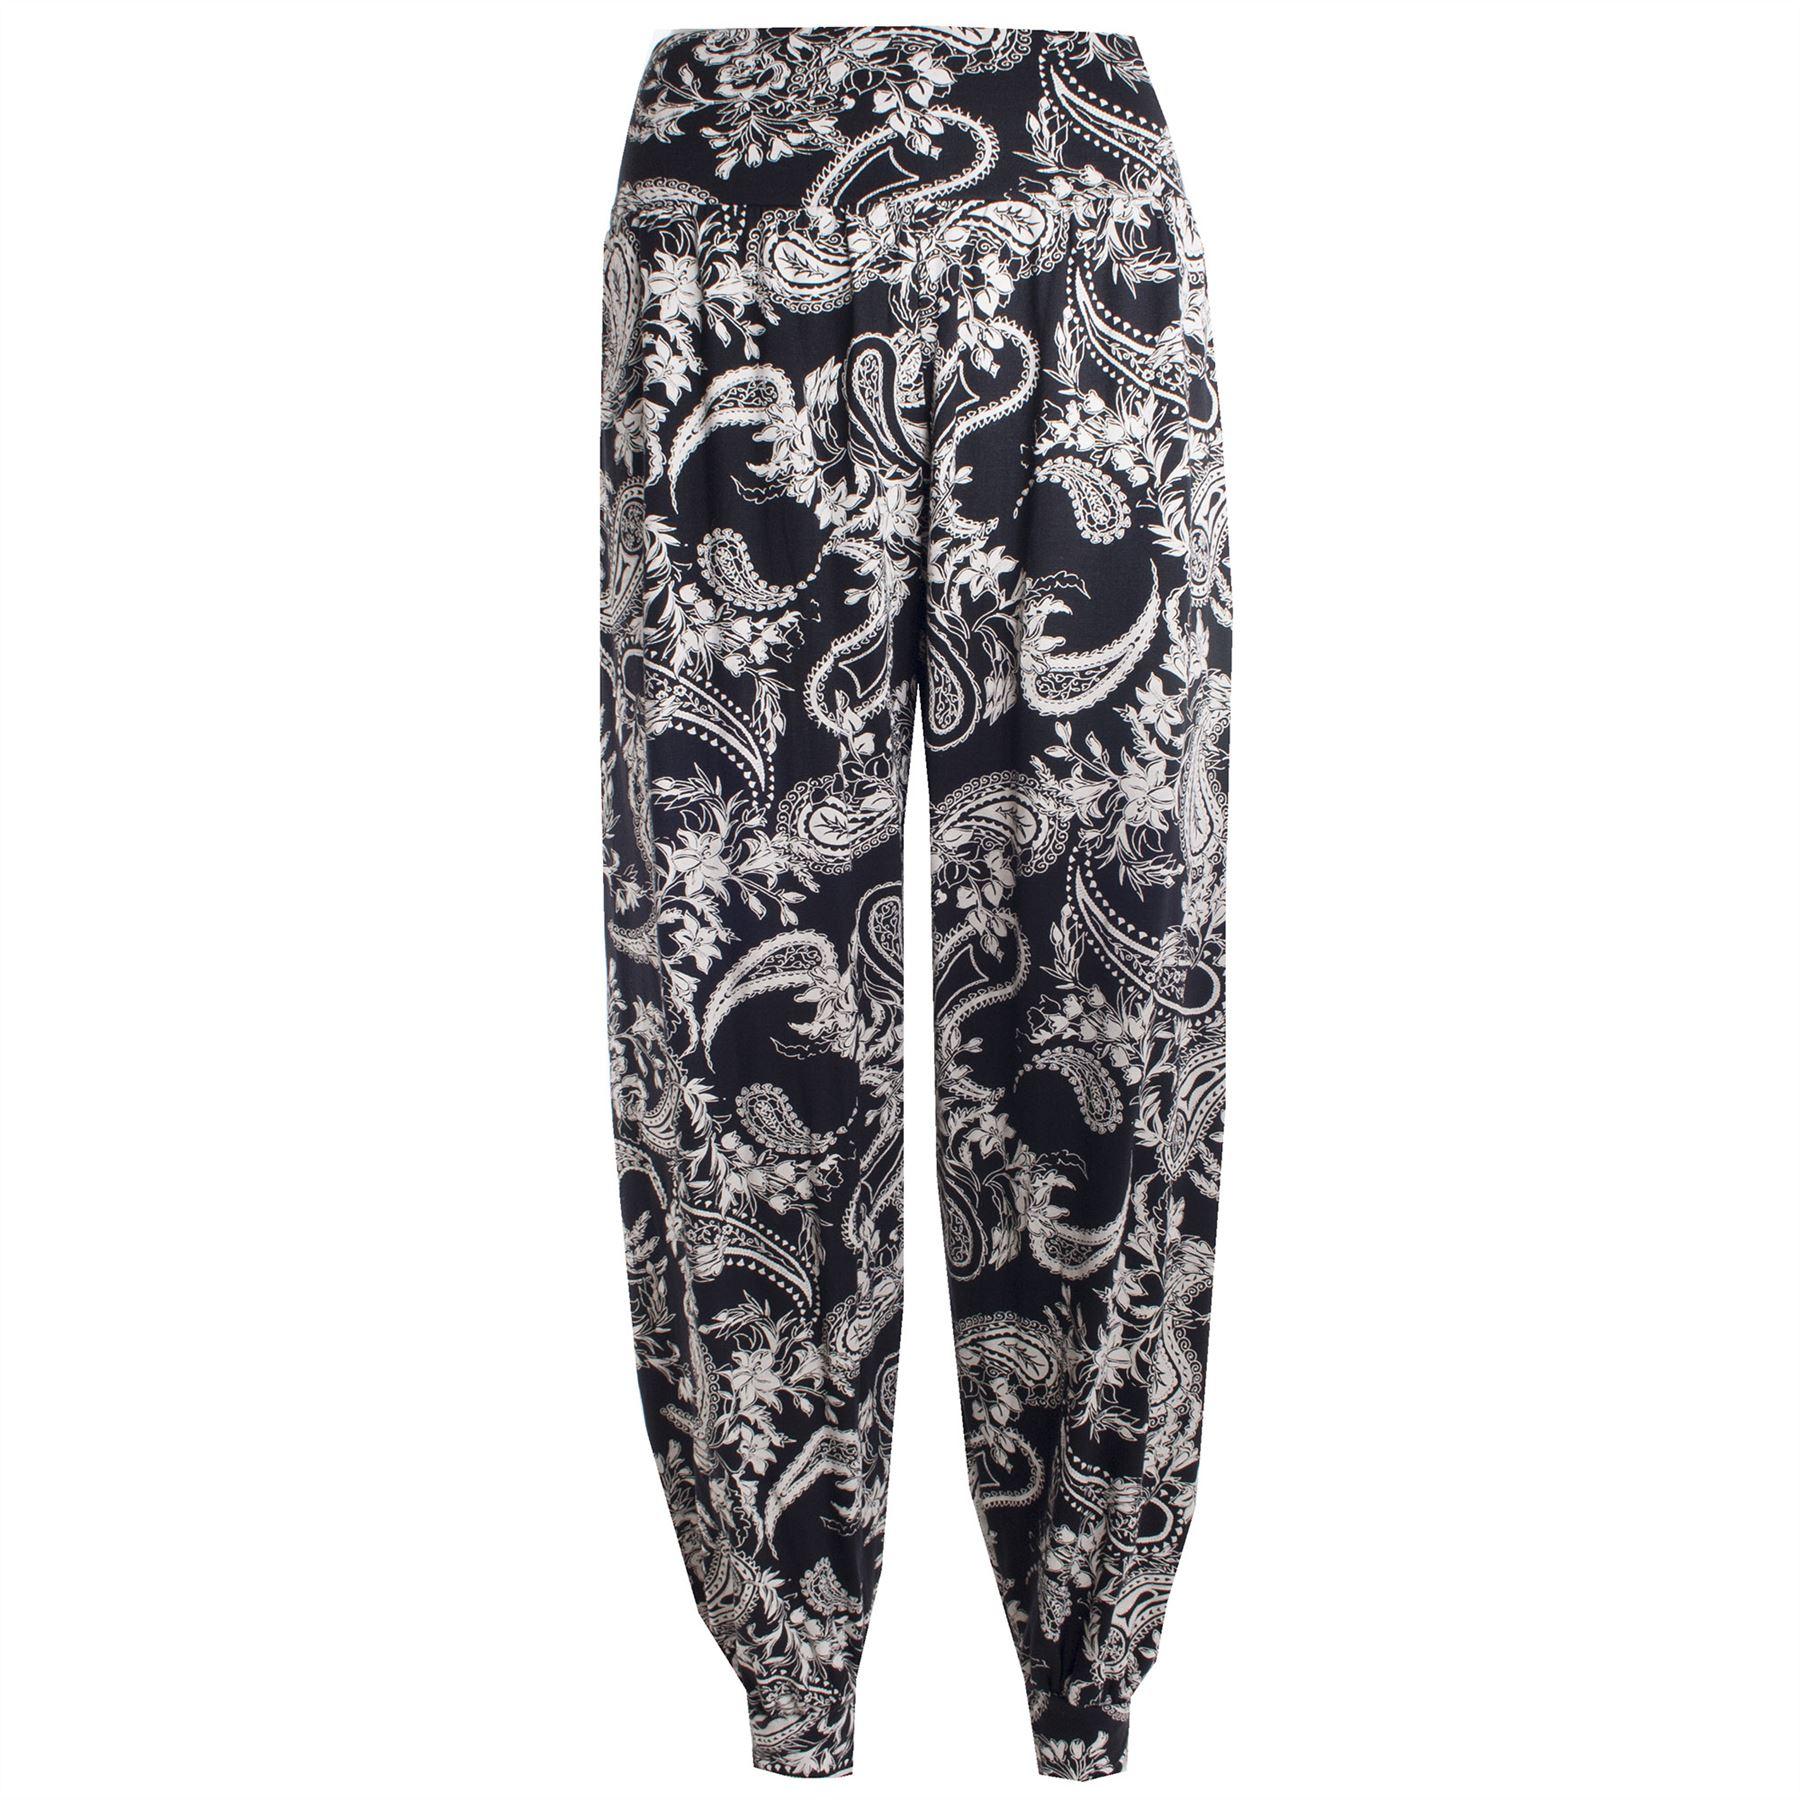 Womens Ladies Harem Pants Printed Ali Baba Bottoms Trousers Leggings Plus Sizes